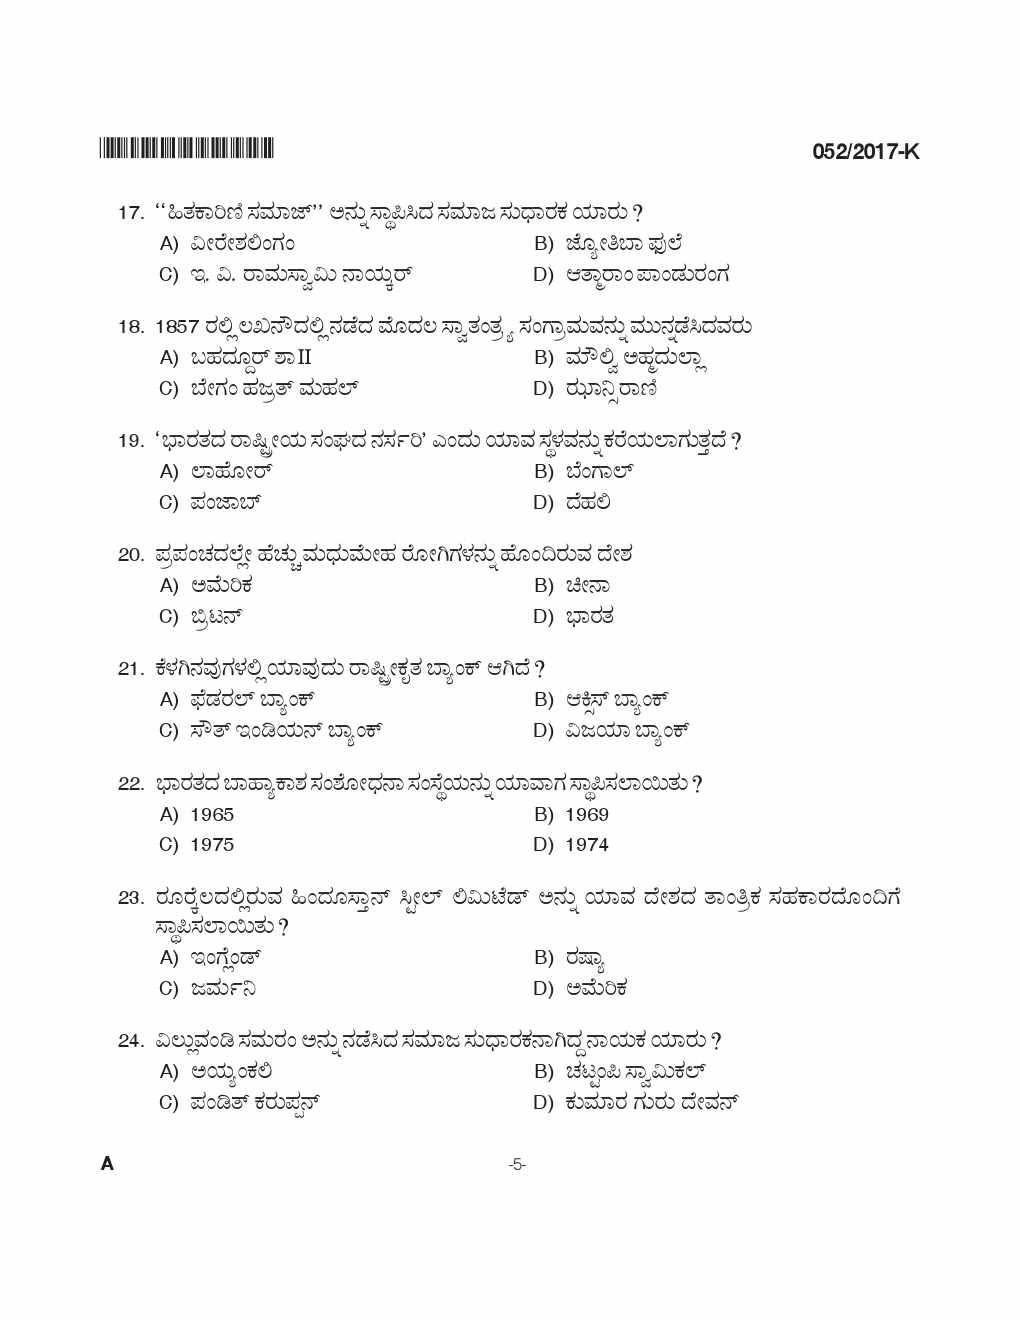 http://masterstudy.net//pdf/psc/women-police-constable-apb-police-question-paper-kannada/q_0522017-k0005.jpg